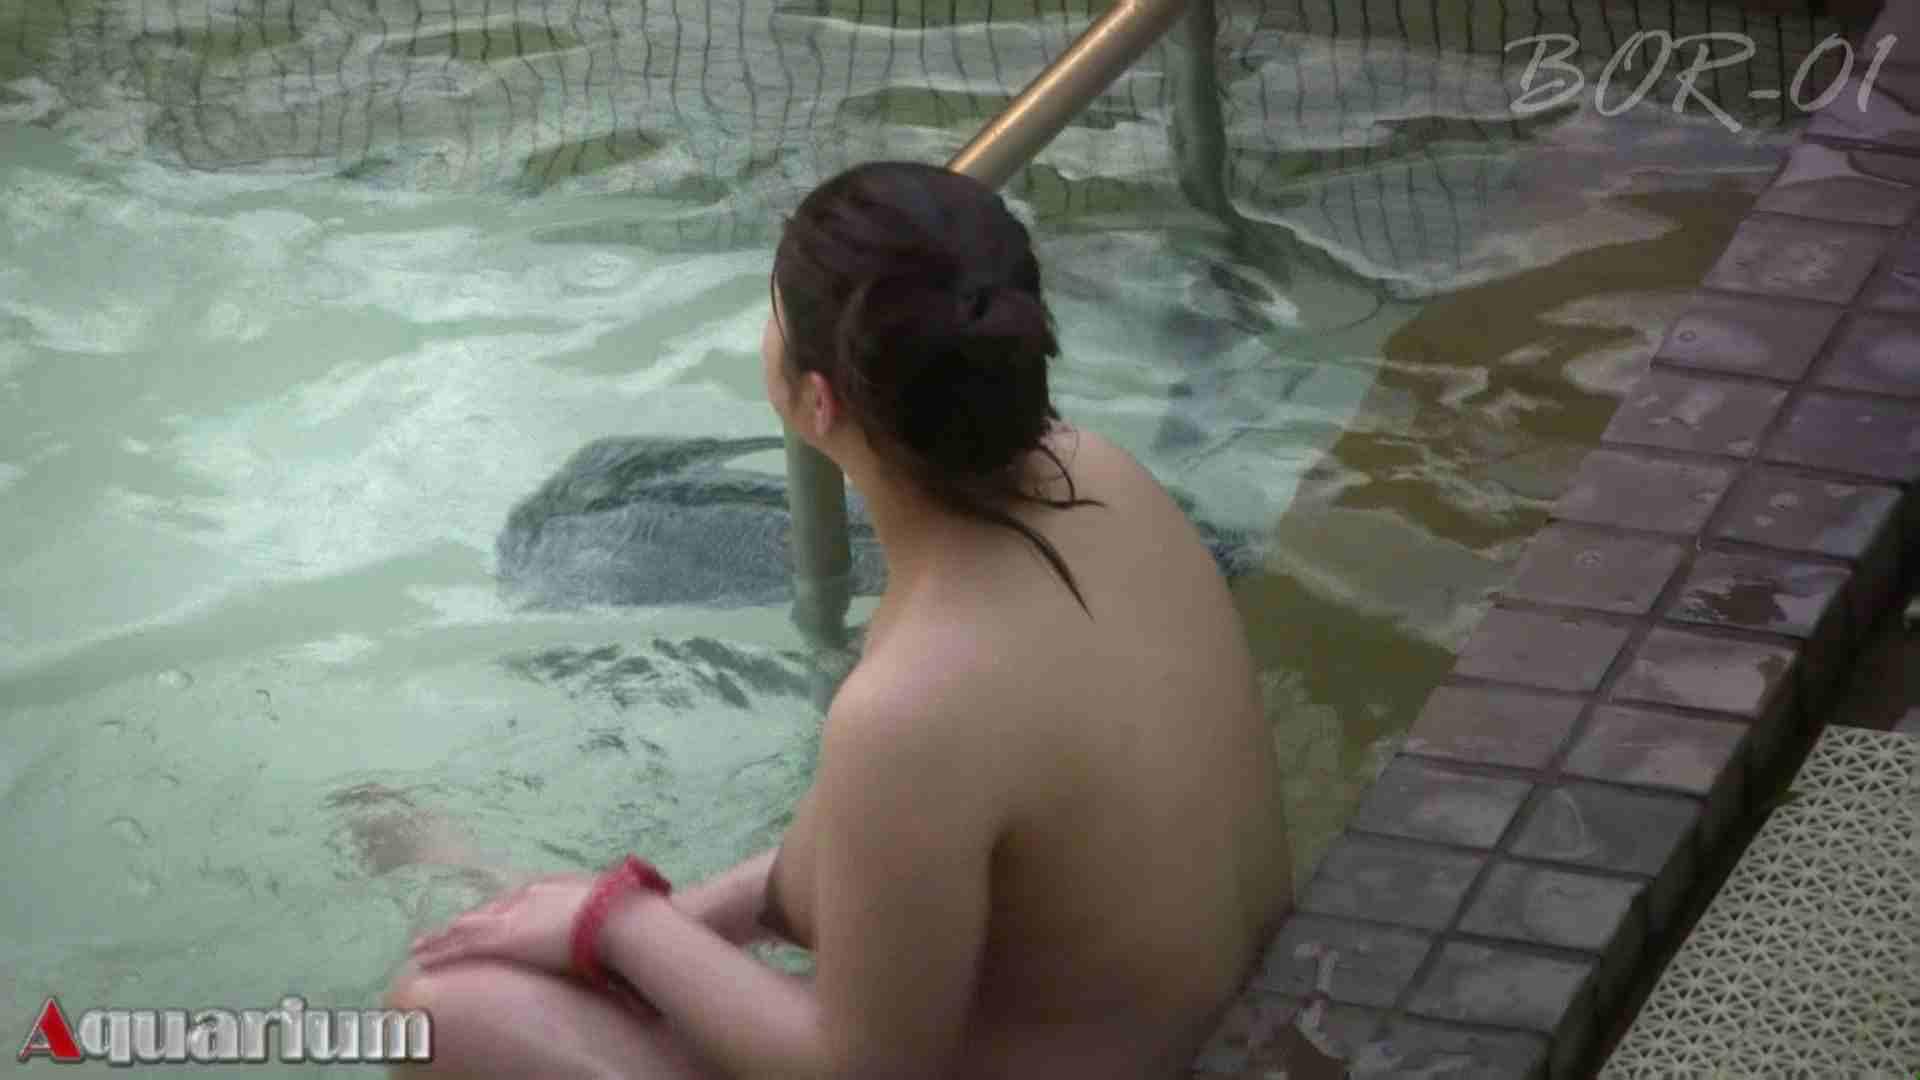 Aquaな露天風呂Vol.464 OL女体  108連発 27